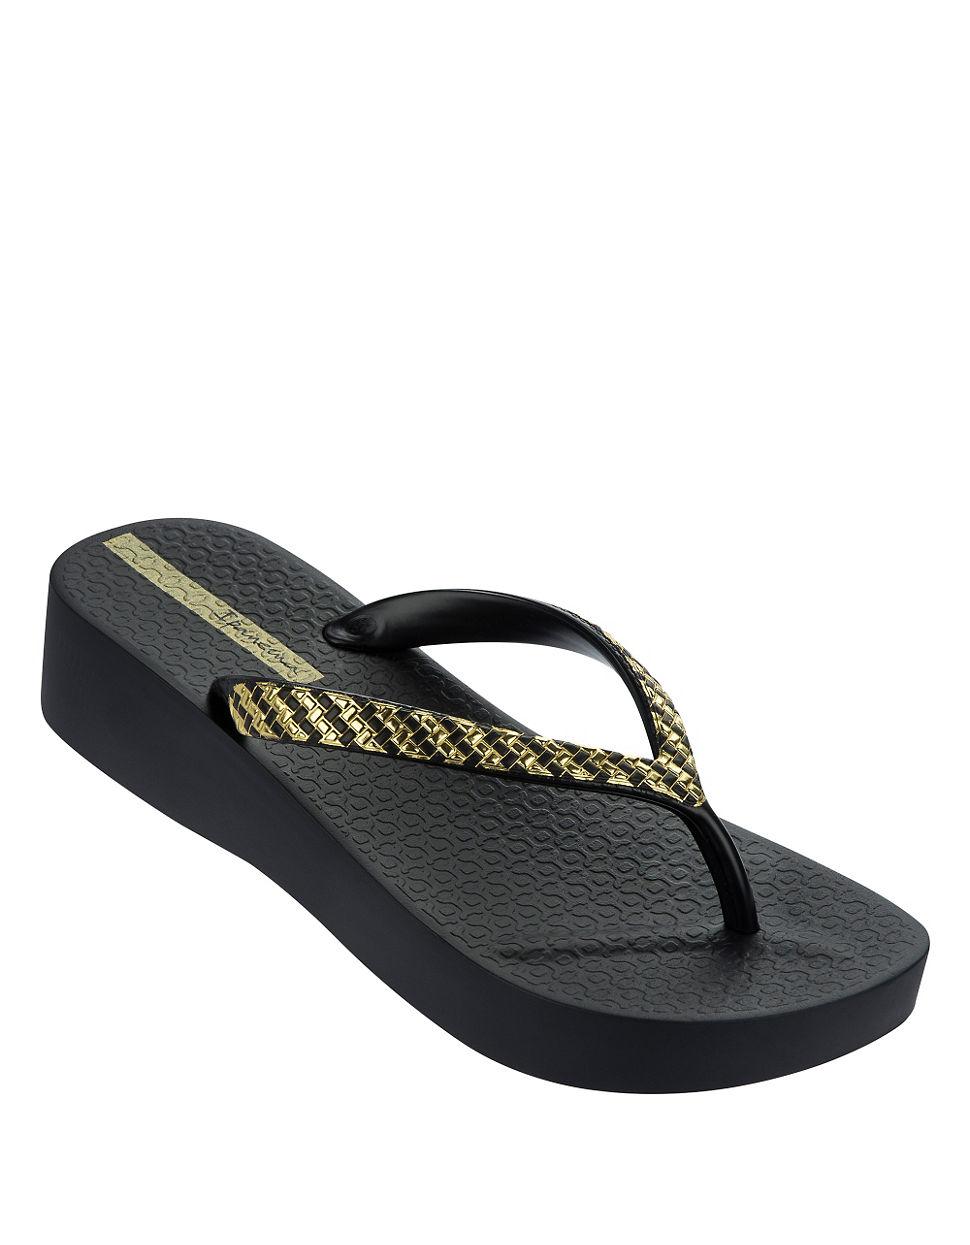 Ipanema Shoes Online Australia